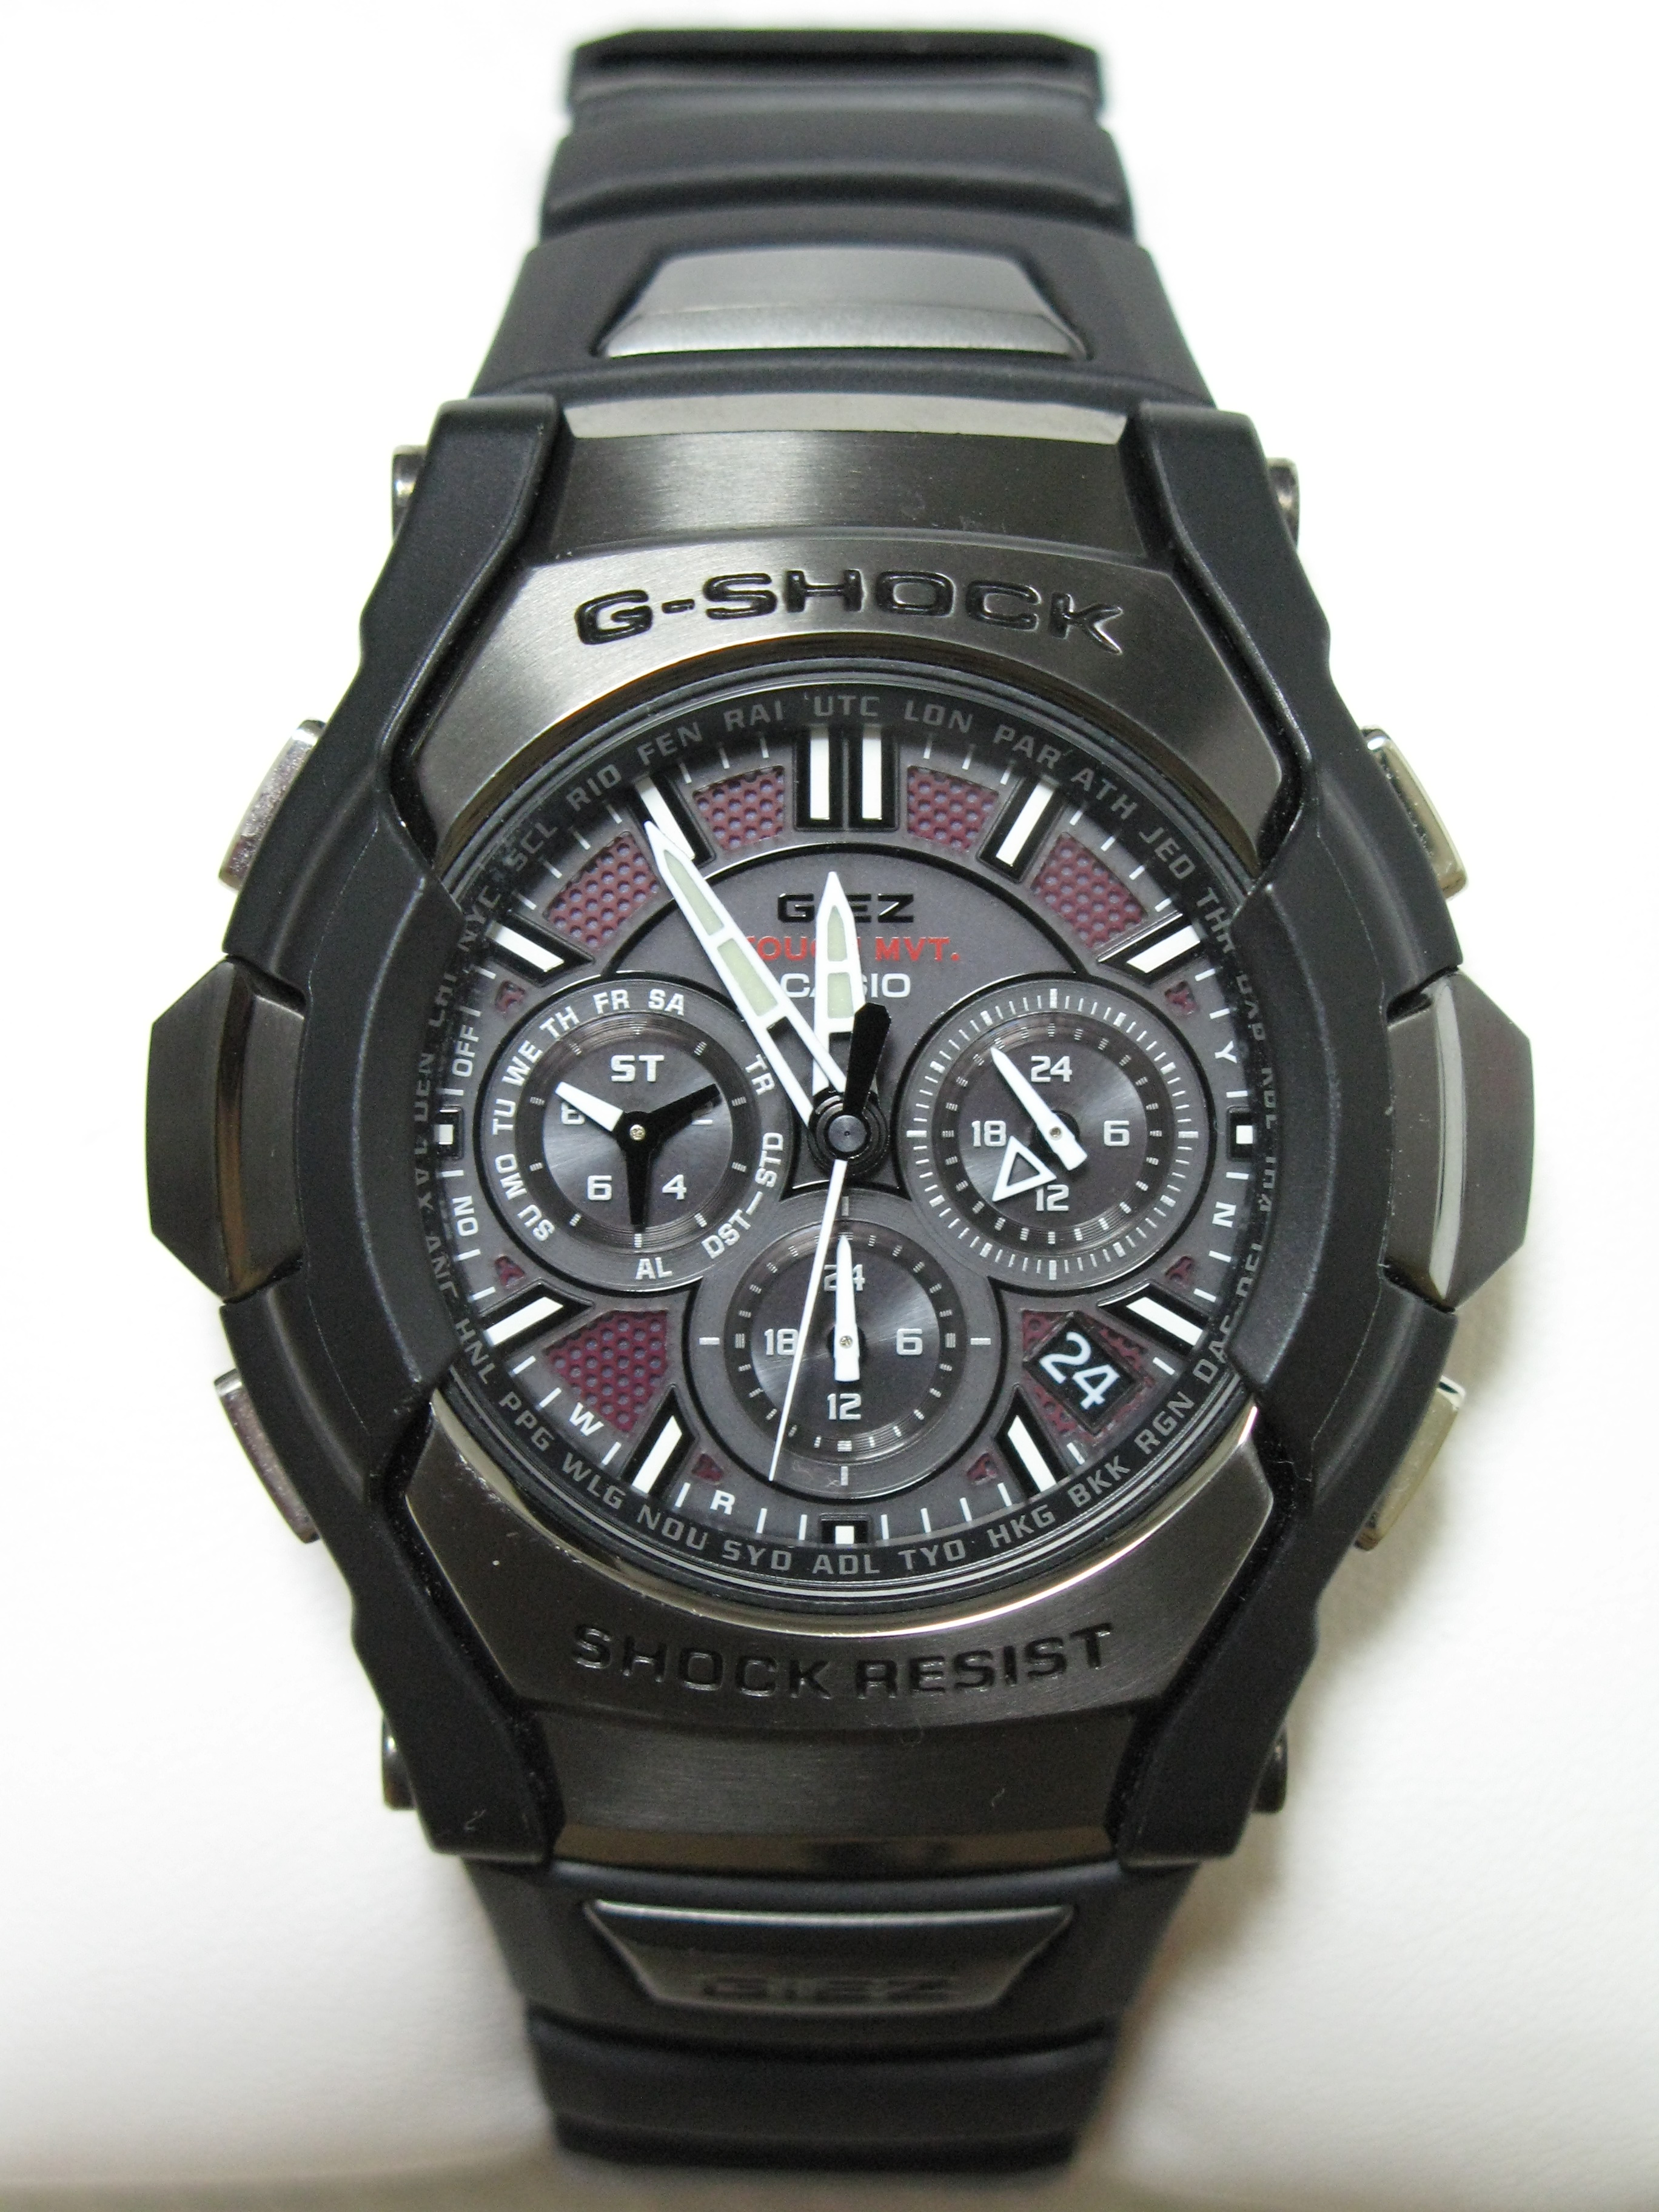 casio_g-shock_gs-1300b-1ajf_01.jpg